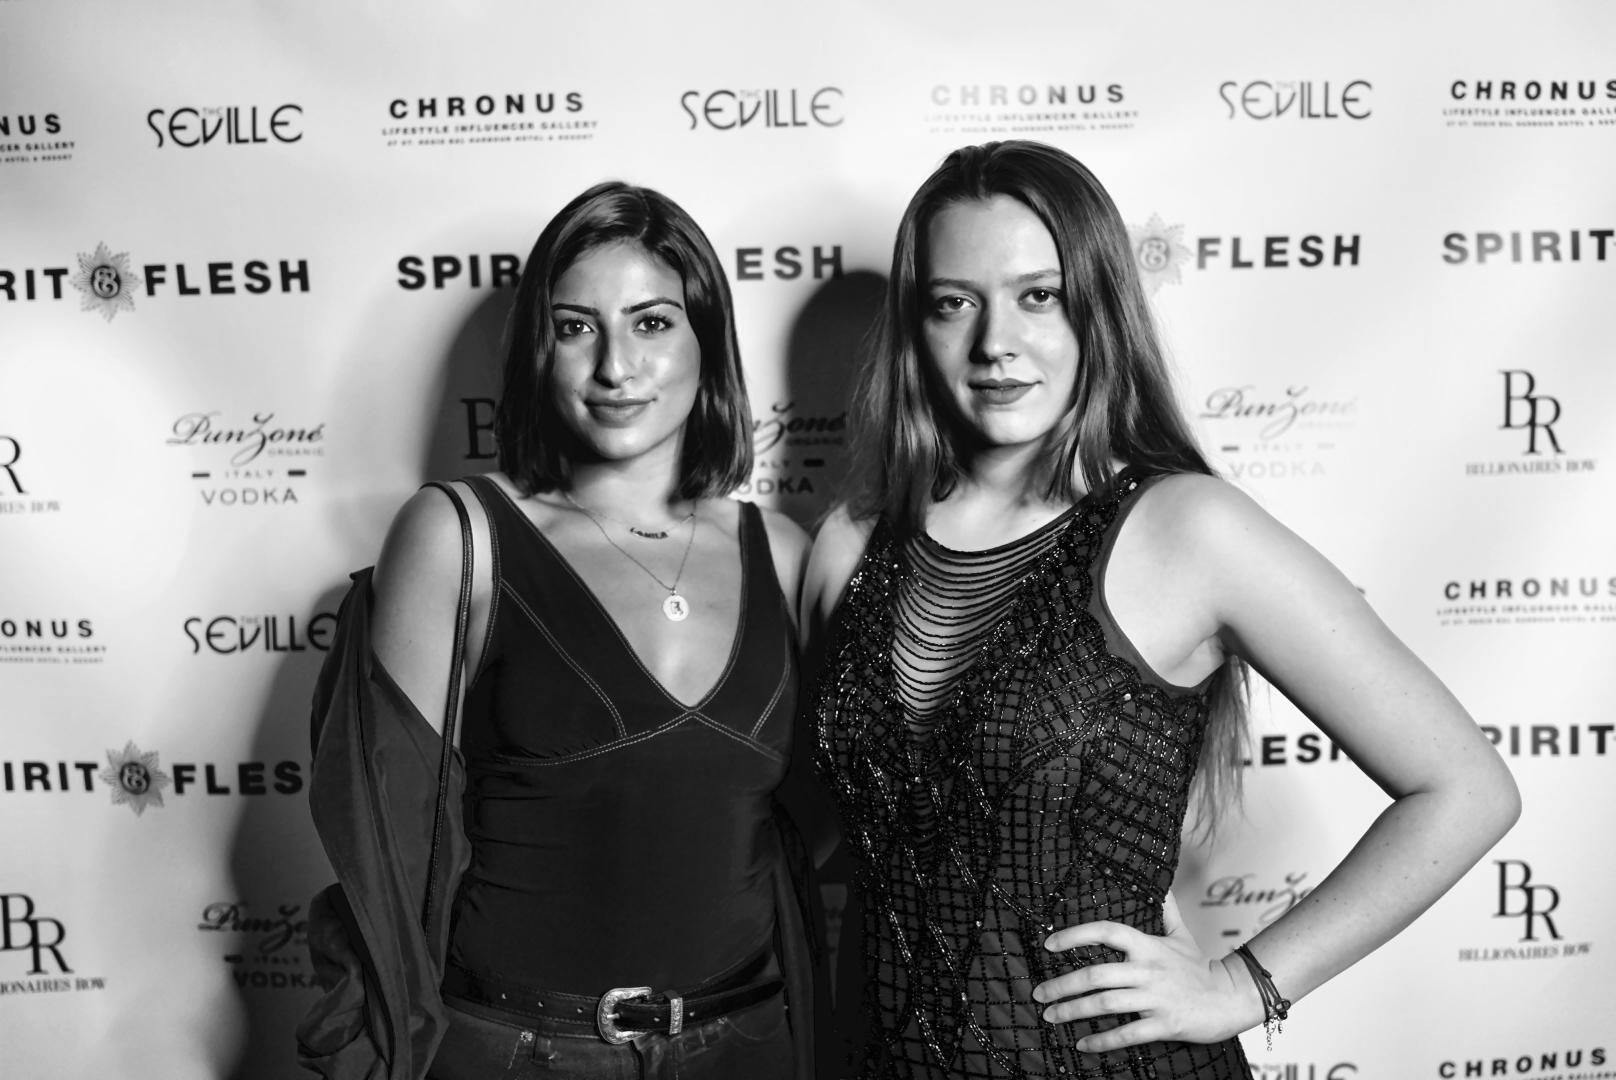 Spirit & Flesh Magazine Jussie Smollett cover event, Camilla Navas & Vasilisa Deyneko by Antonio Navas